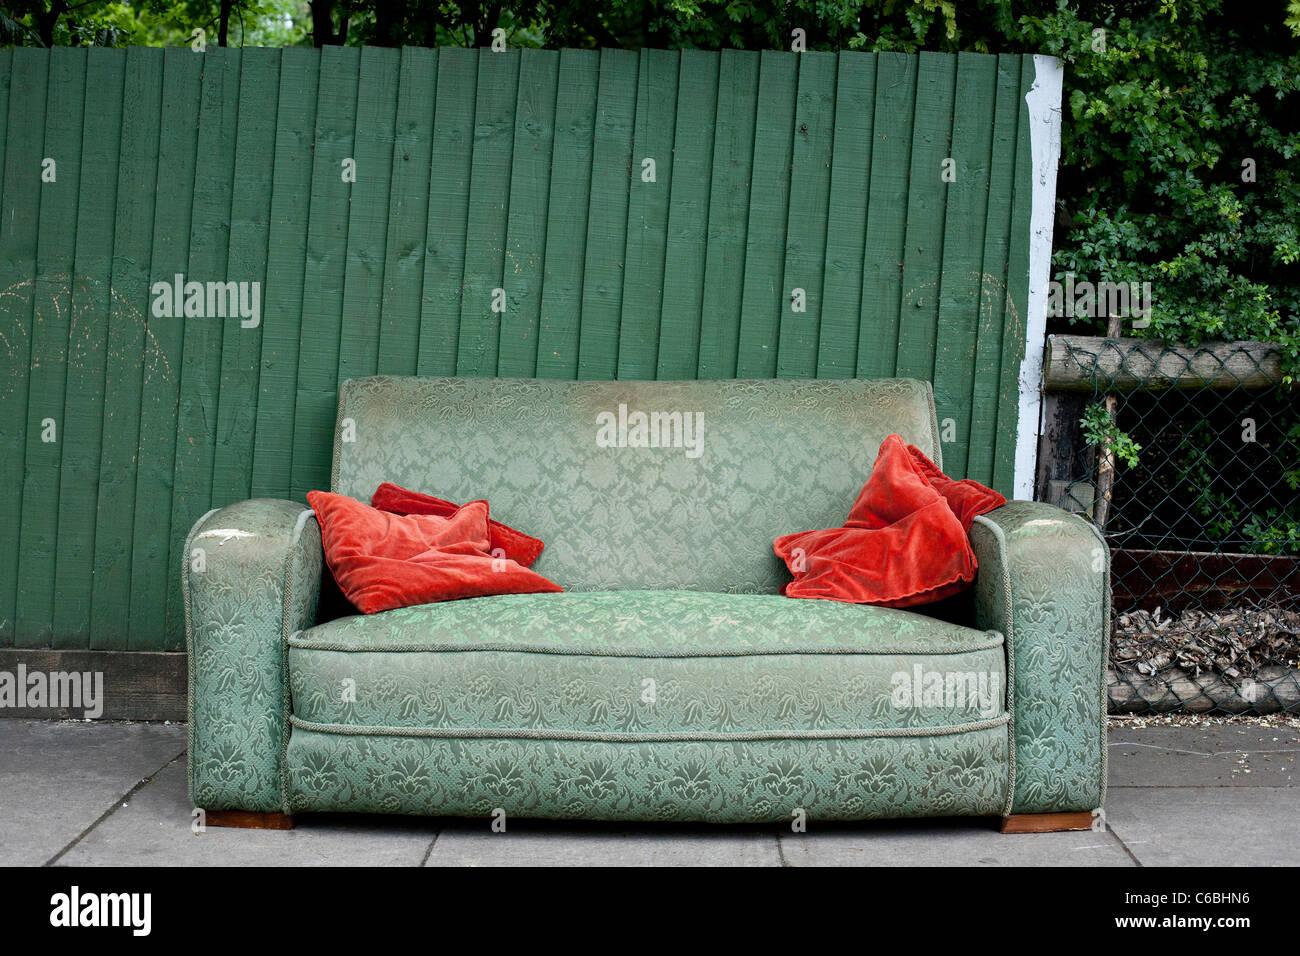 Abandoned sofa on a street - Stock Image